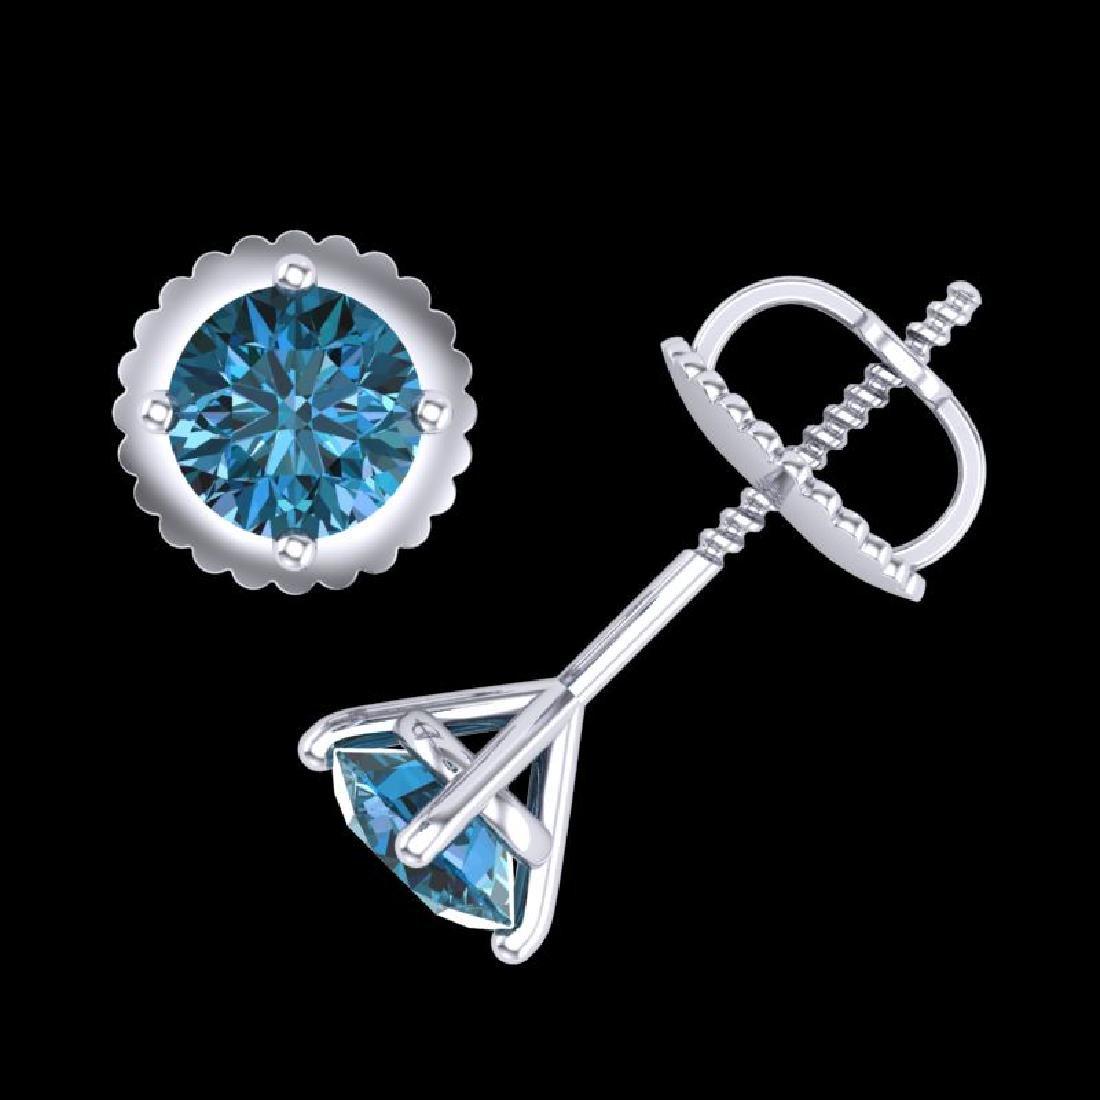 0.65 CTW Fancy Intense Blue Diamond Art Deco Stud - 3